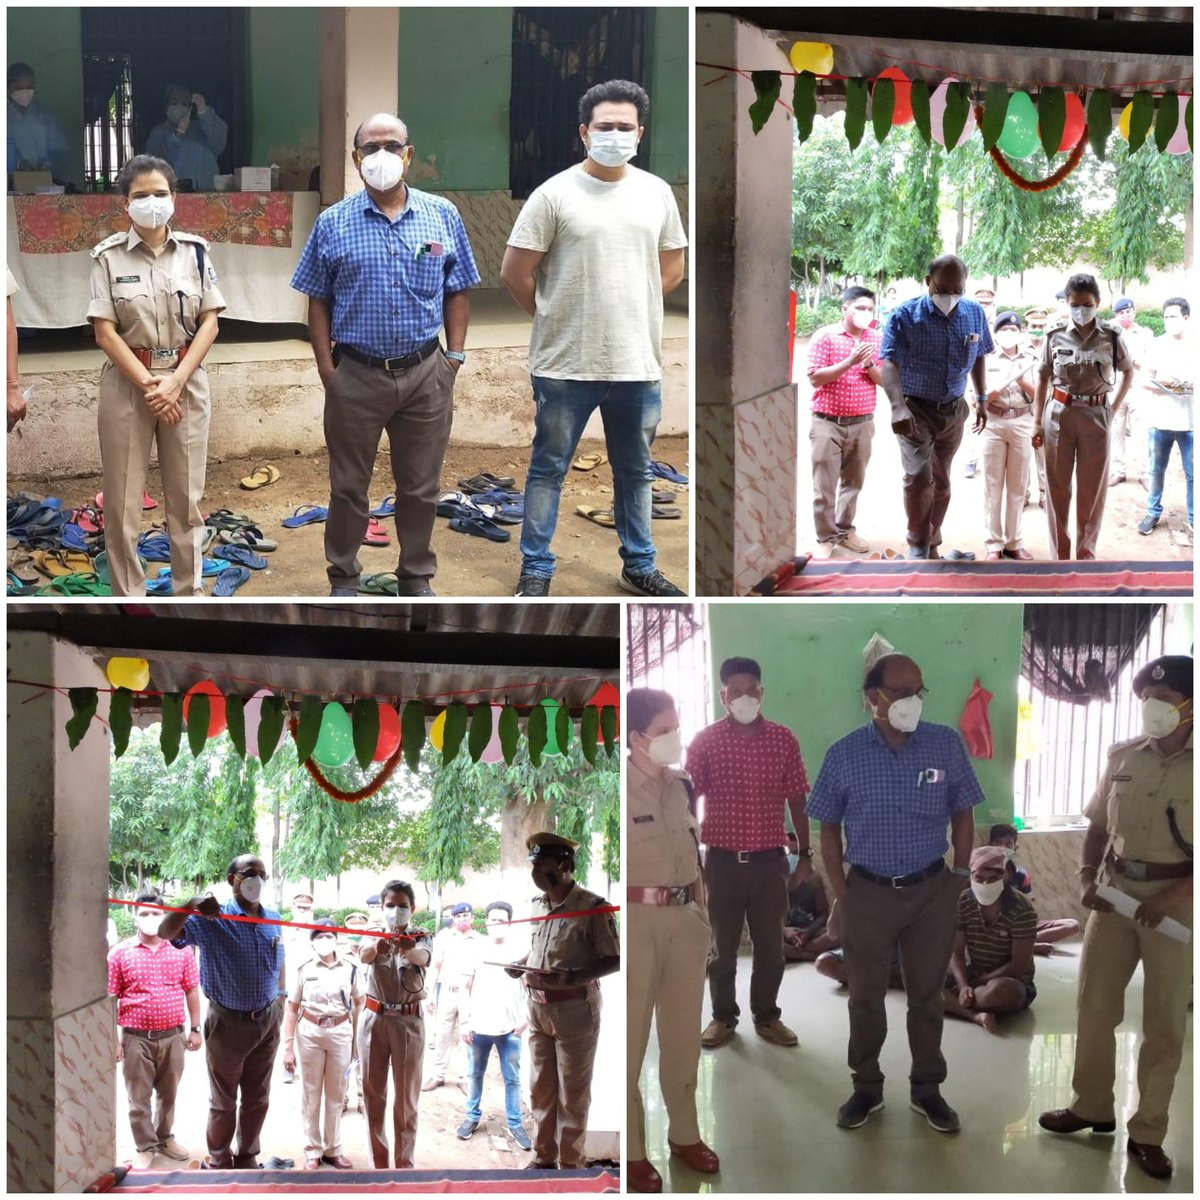 #Vaccination drive for inmates in the age group of 18 to 44 was done in Sundargarh District Jail in the continued effort to beat the #covid pandemic. @DGPOdisha @odisha_police @PMOIndia @CMO_Odisha @MoHFW_INDIA @HFWOdisha @digwrrkl @sagarika_nath @DMSundargarh @CSundargarh https://t.co/MU3JyuKLsL